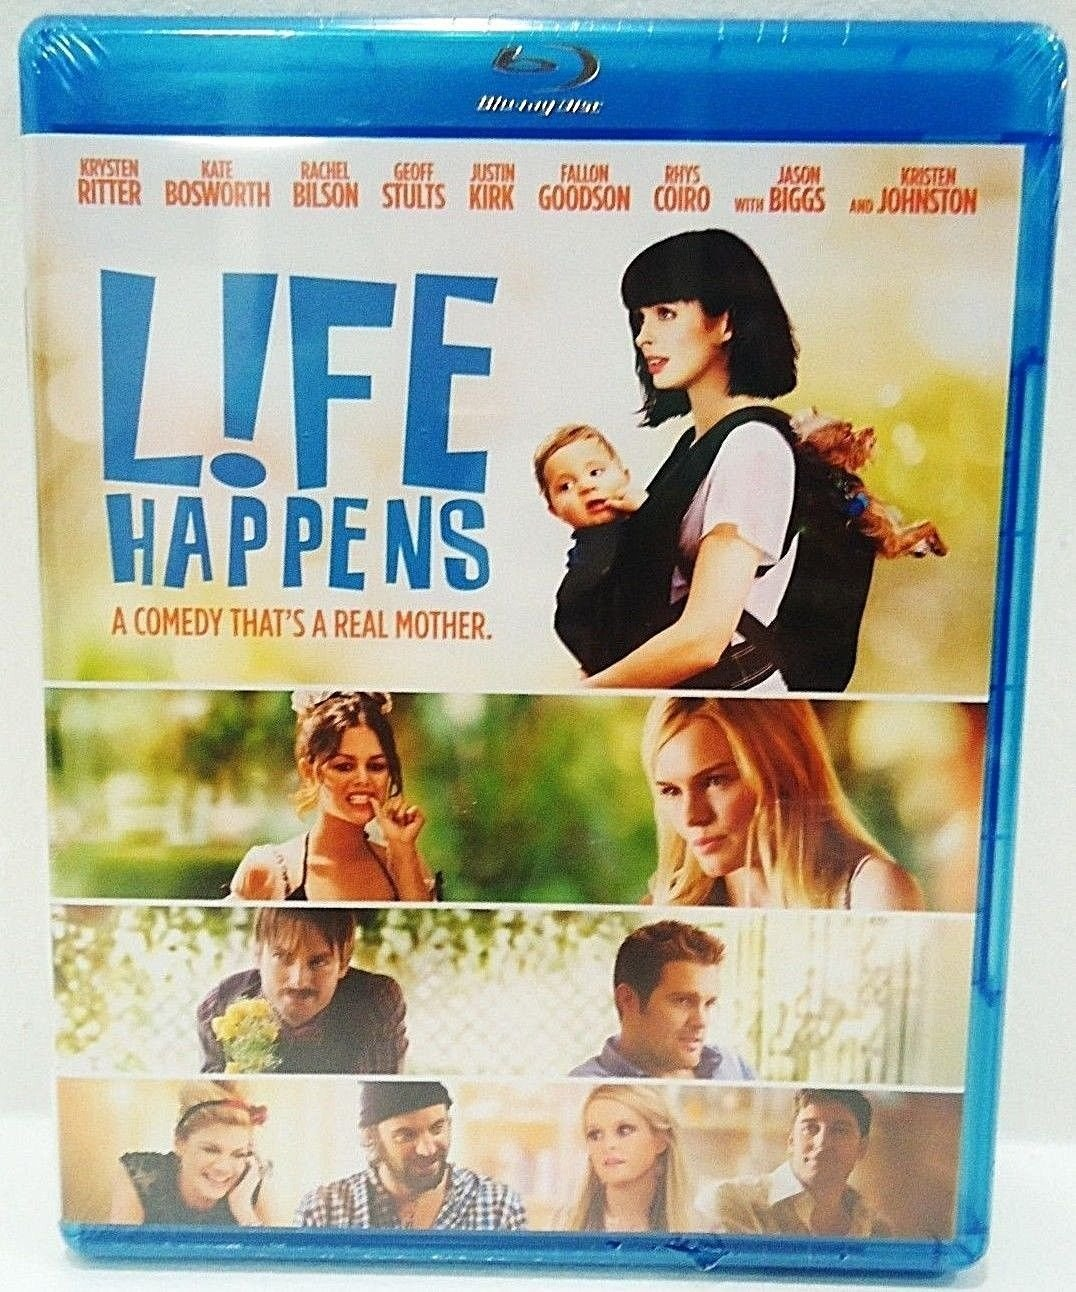 LIFE HAPPENS - BLU-RAY - DVD - KRYSTEN RITTER - NEW - COMEDY - MOTHERHOOD - FILM